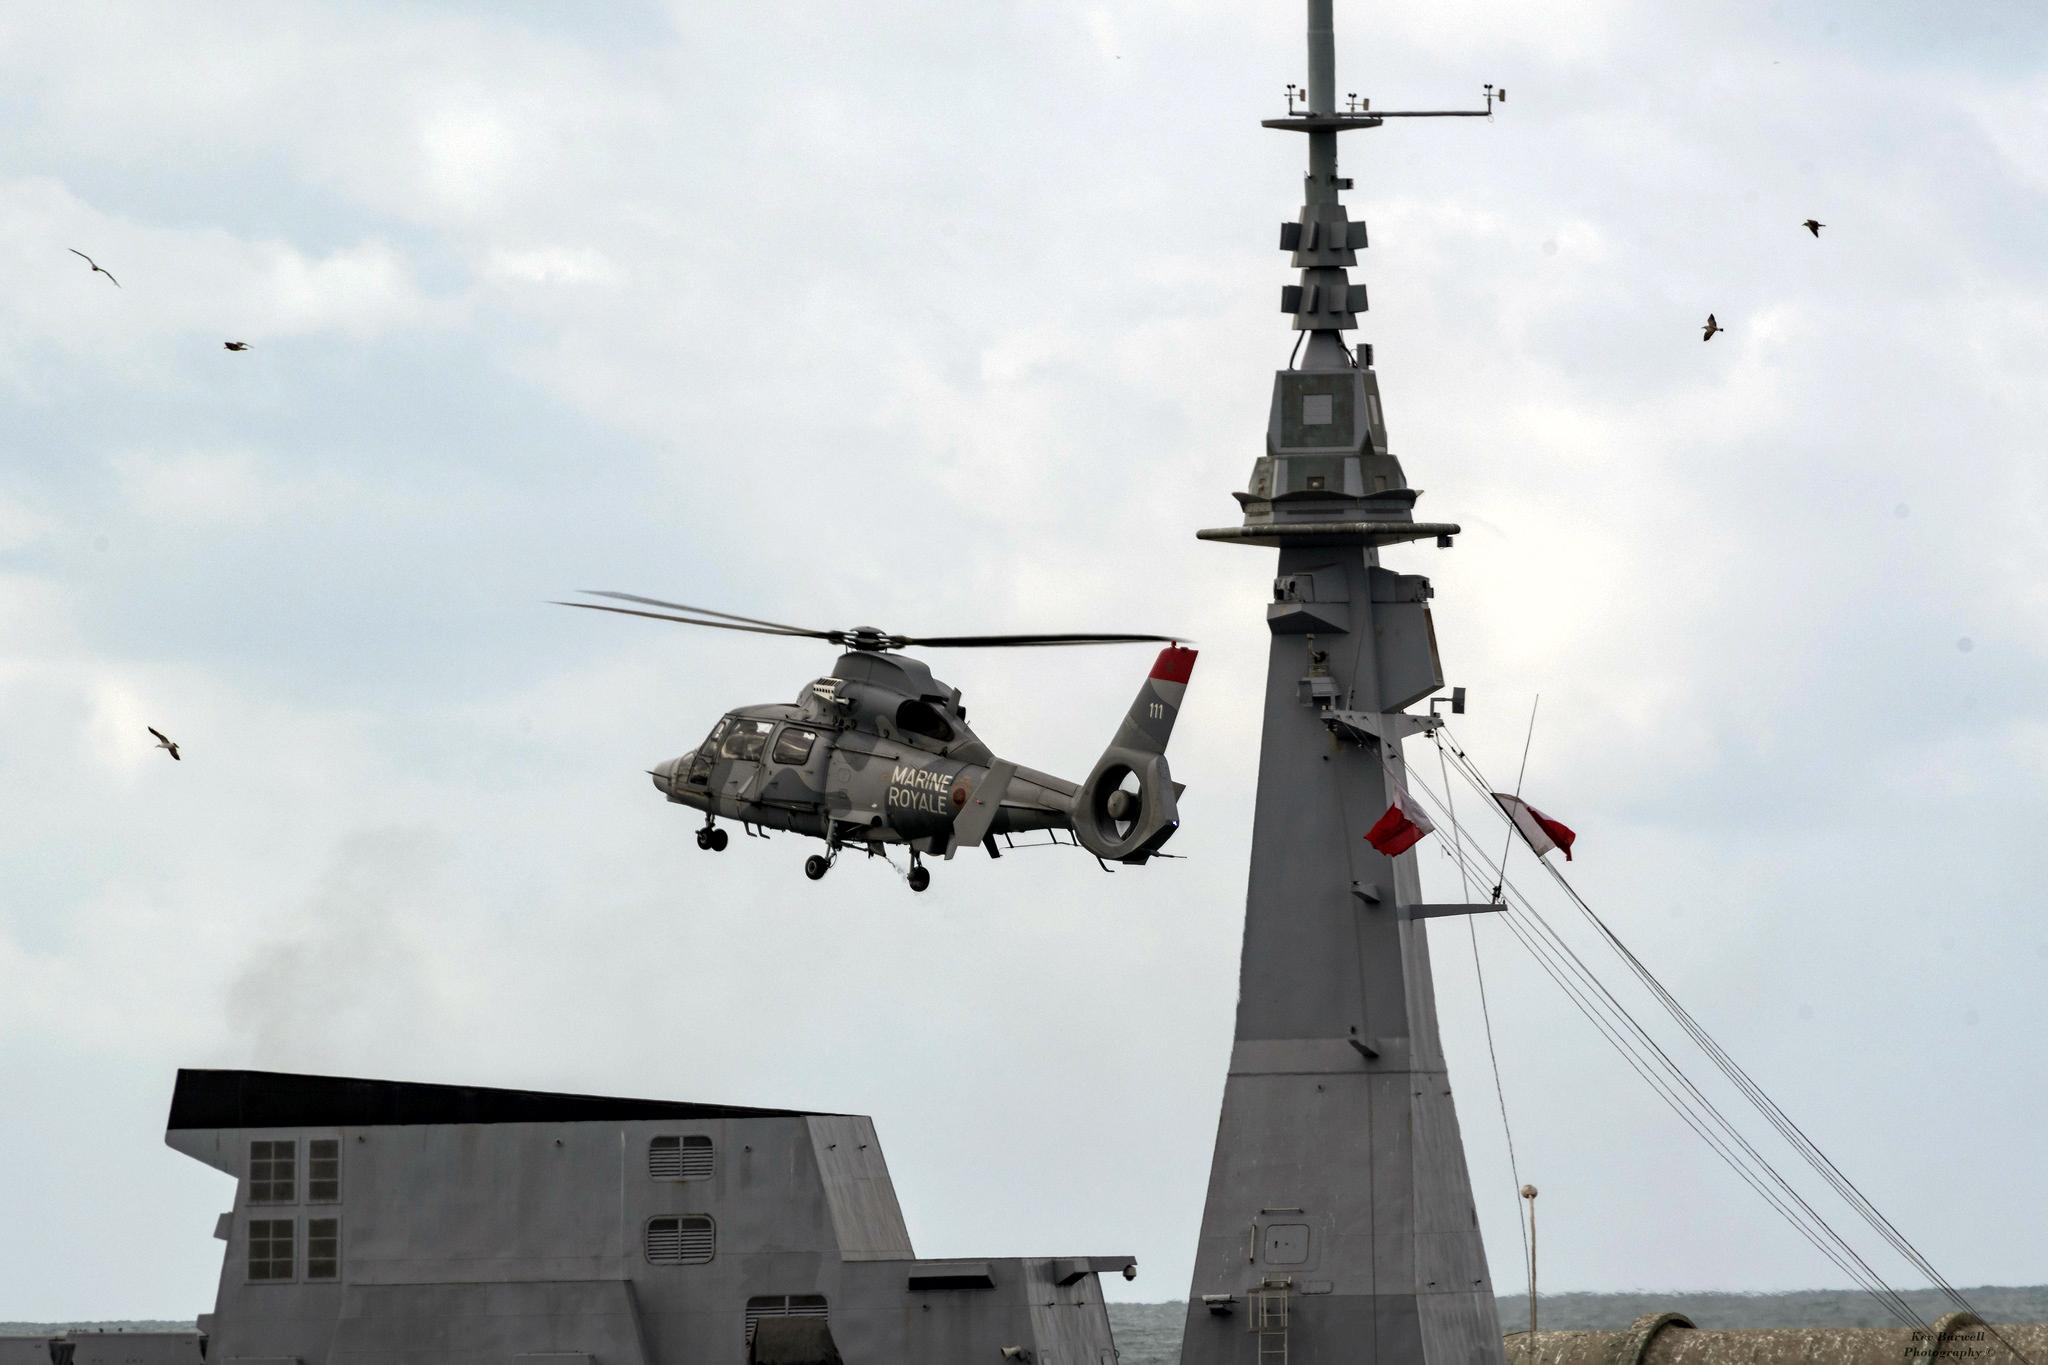 Photos Helicopteres de la MR - Page 4 41263105471_94e997aa1e_o